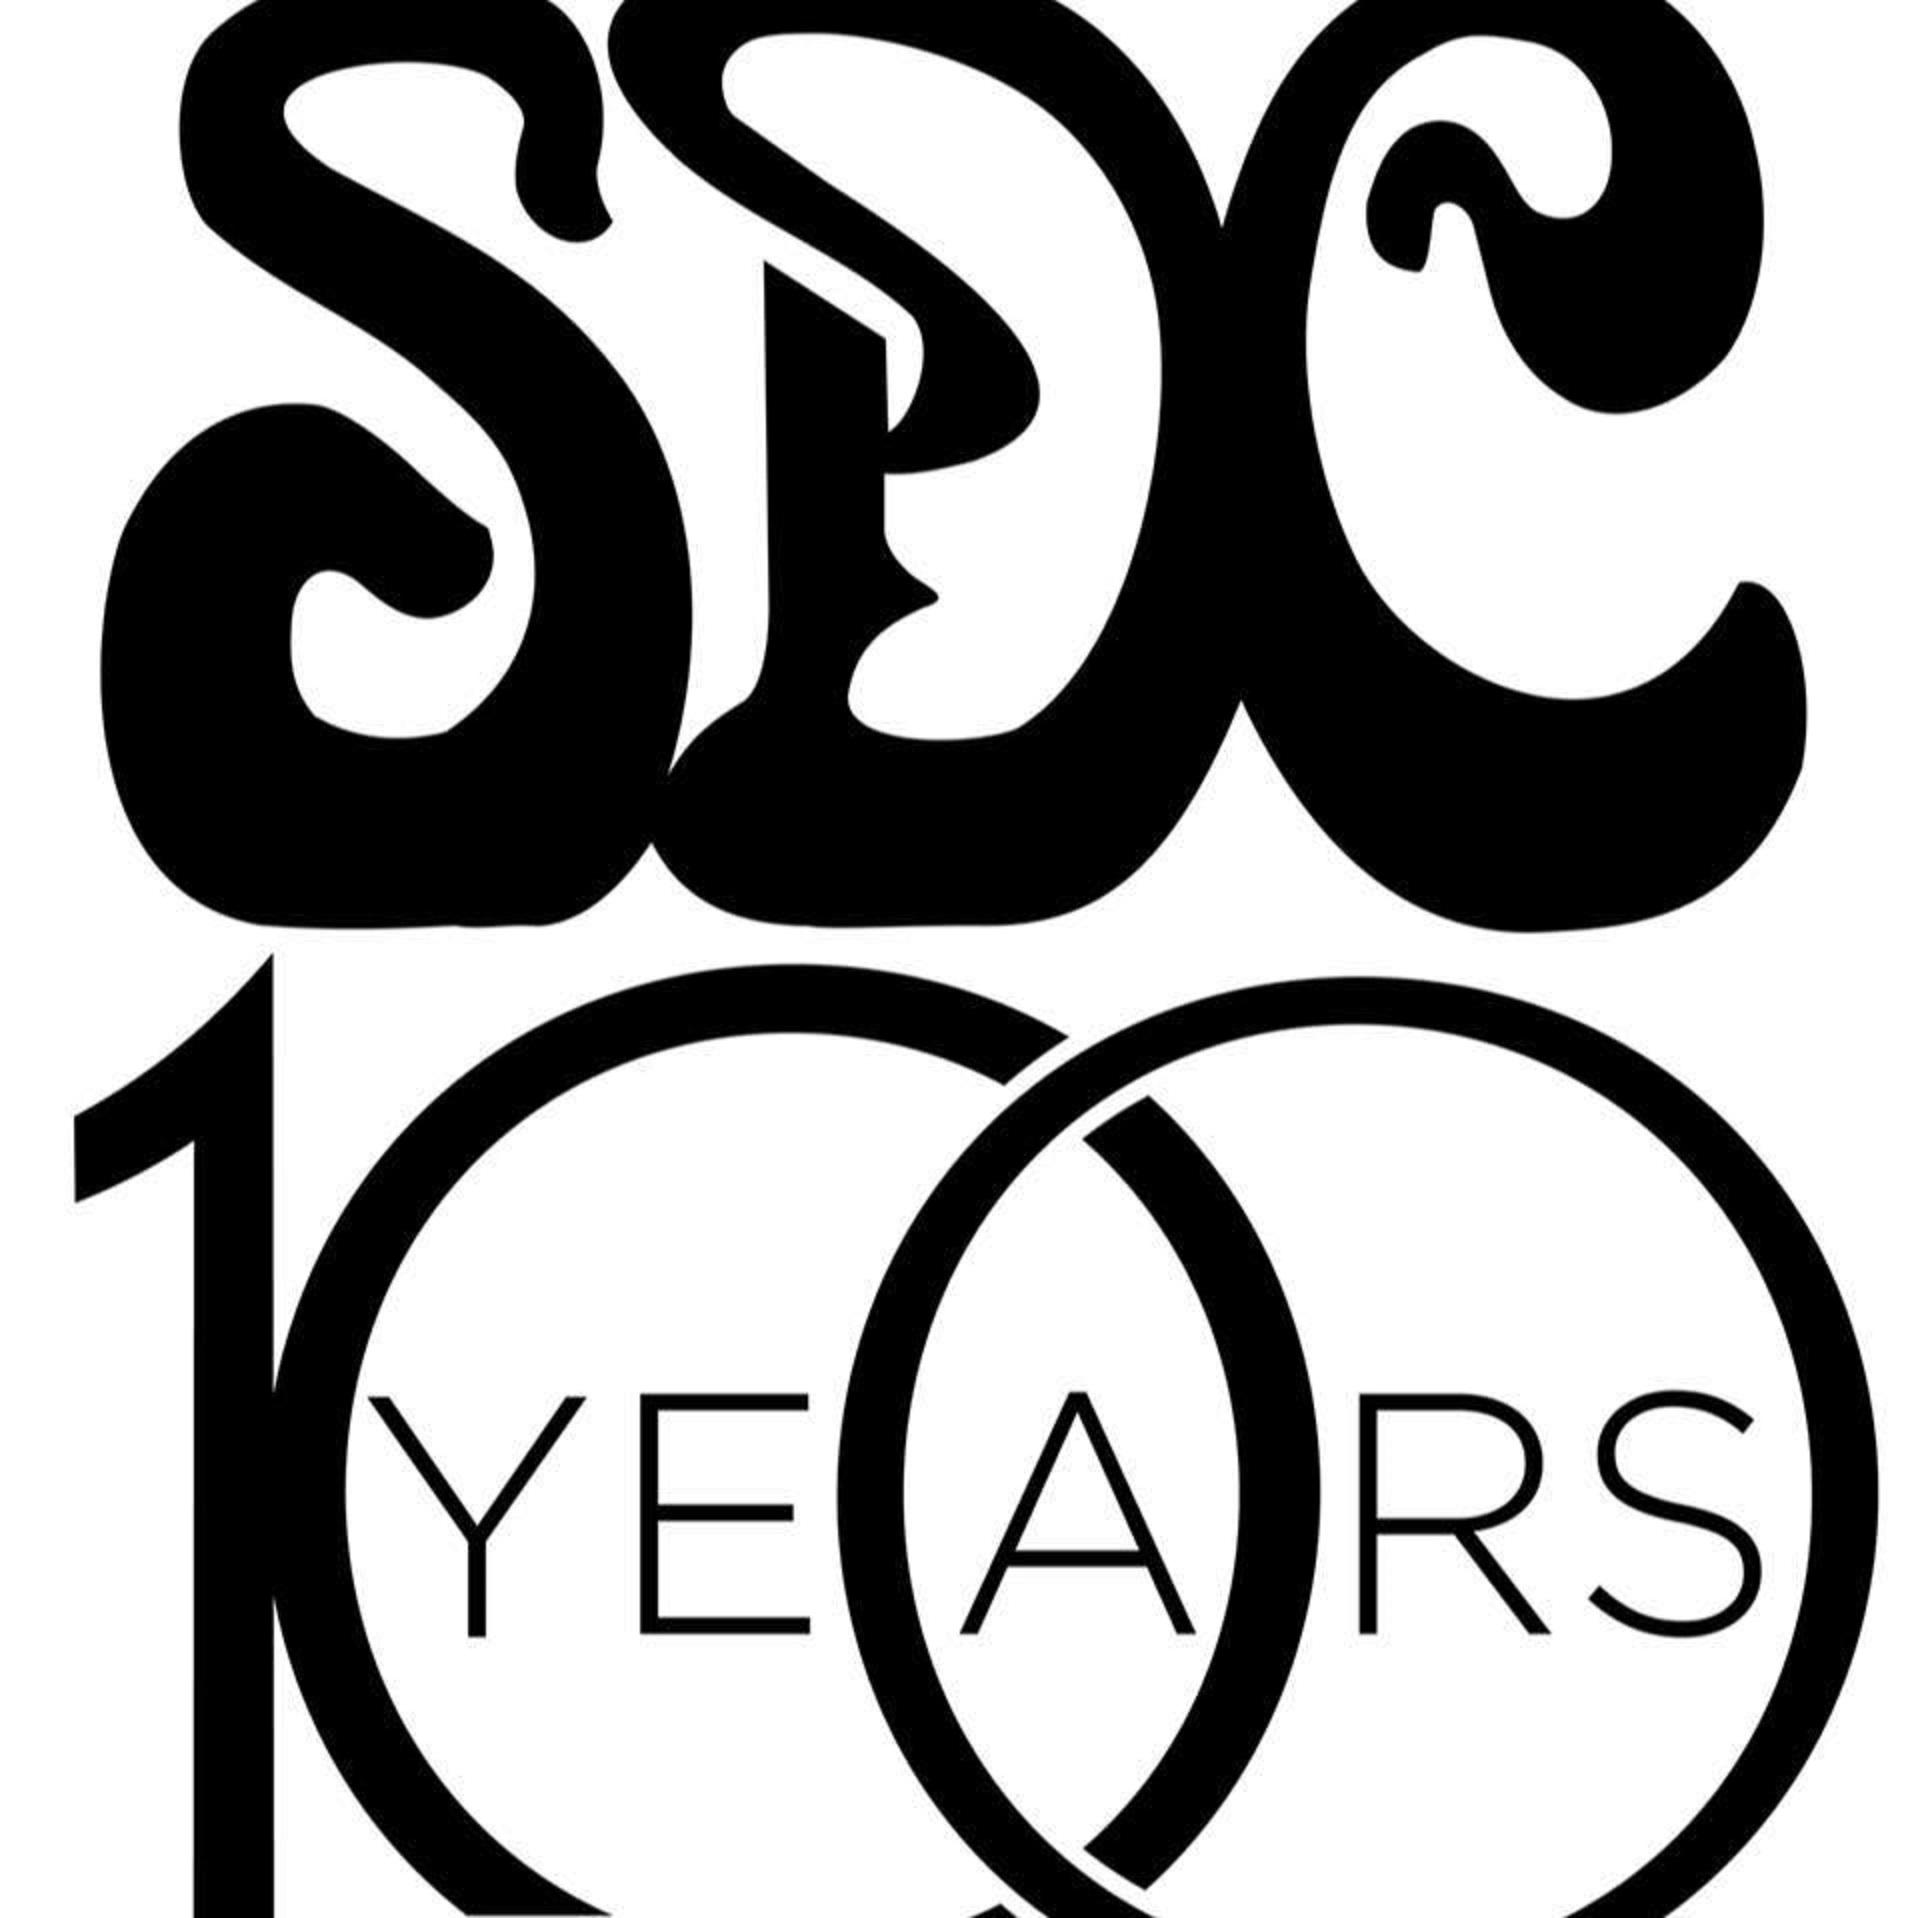 SLF_logo_-_2_1619775021.jpg